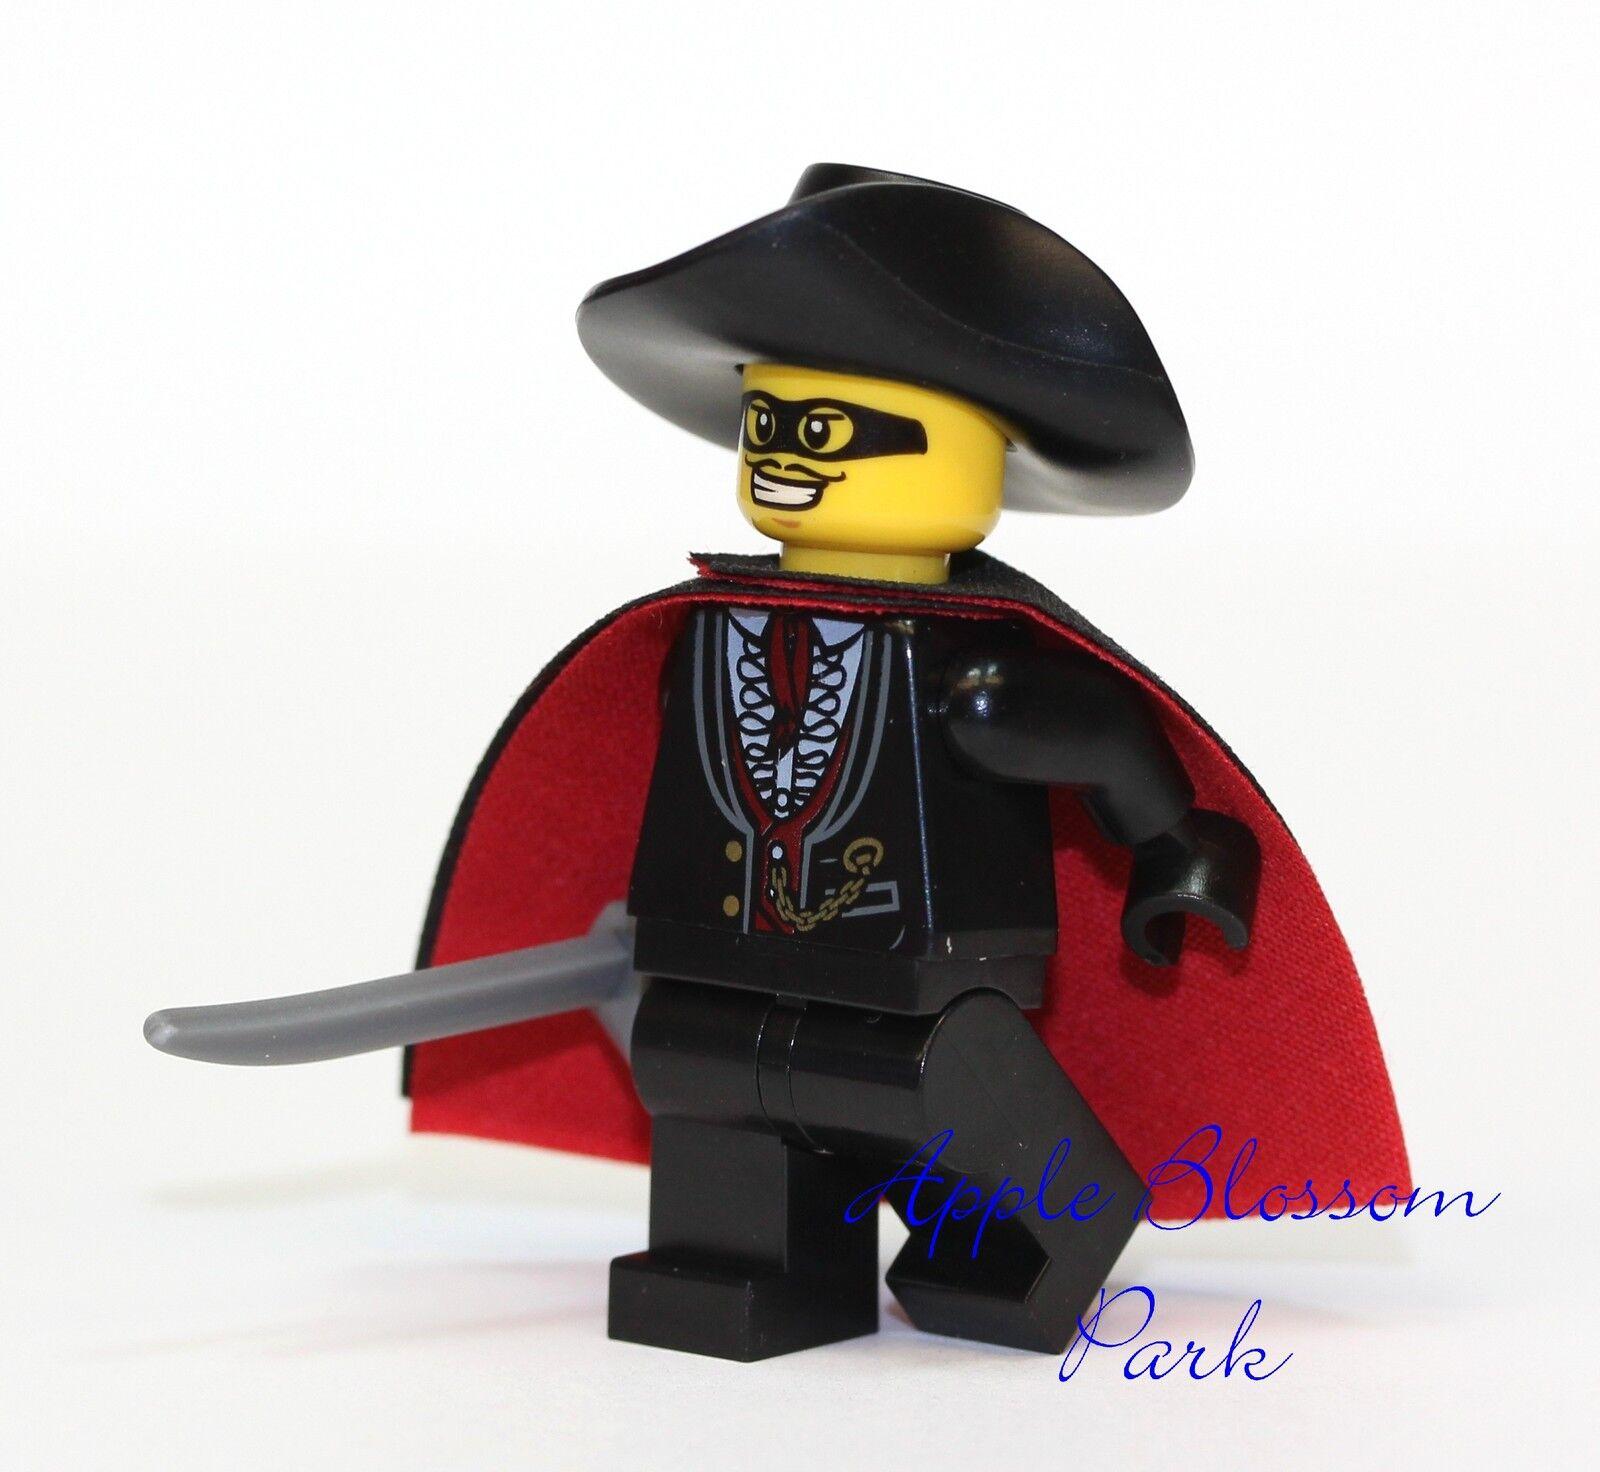 Lego Zorro Minifigure - Castle Minifig W/black Red Cape Sword & Fedora Hat